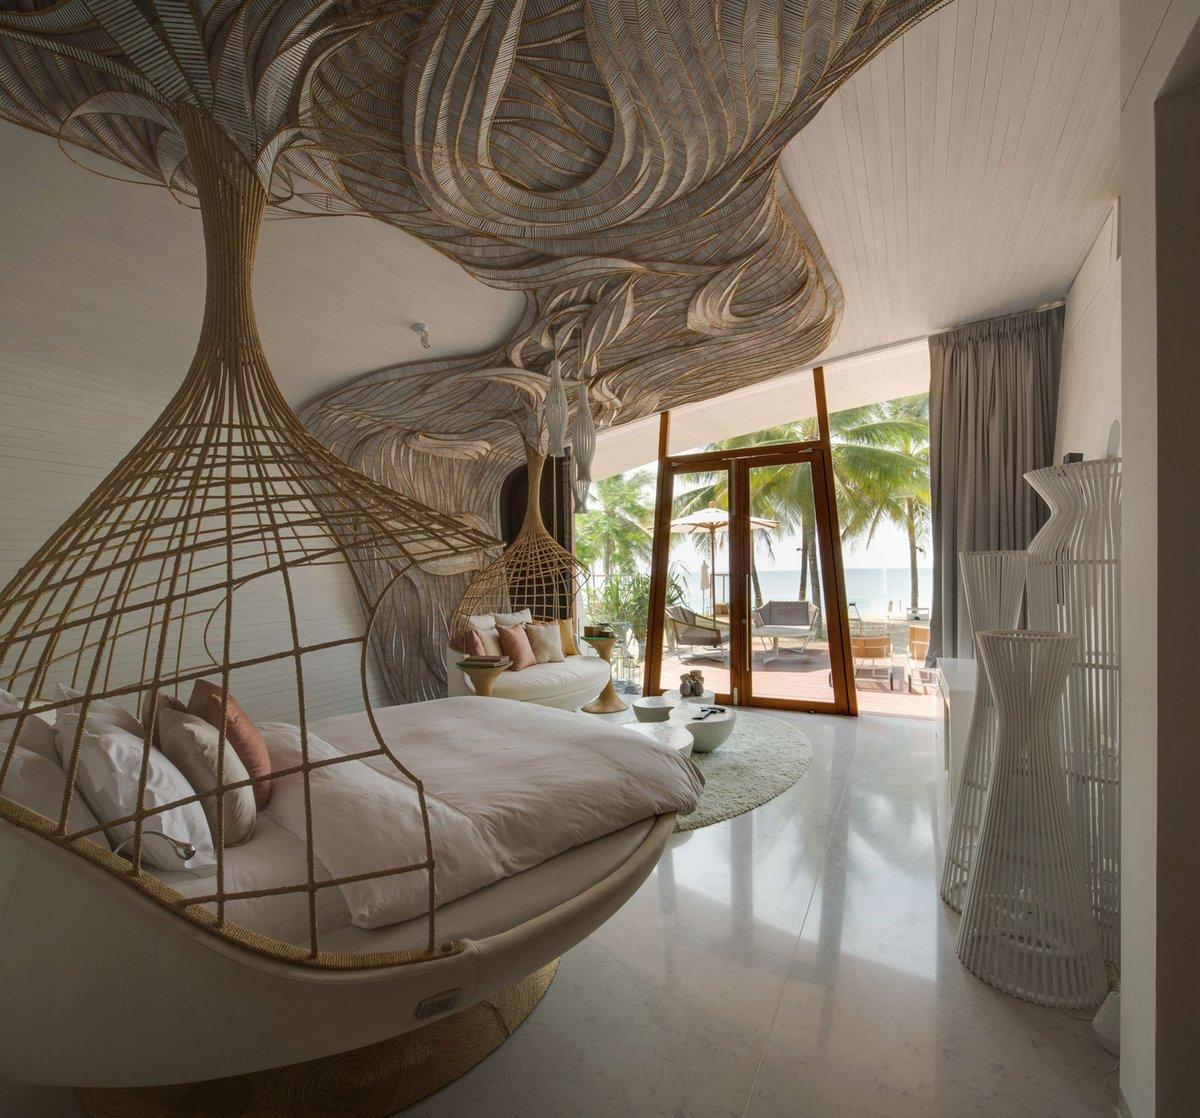 Вилла Siam, Villa Siam, Iniala Beach House, Iniala Thailand, аренда виллы в Таиланде, роскошные виллы в Таиланде, элитное жилье в Таиланде